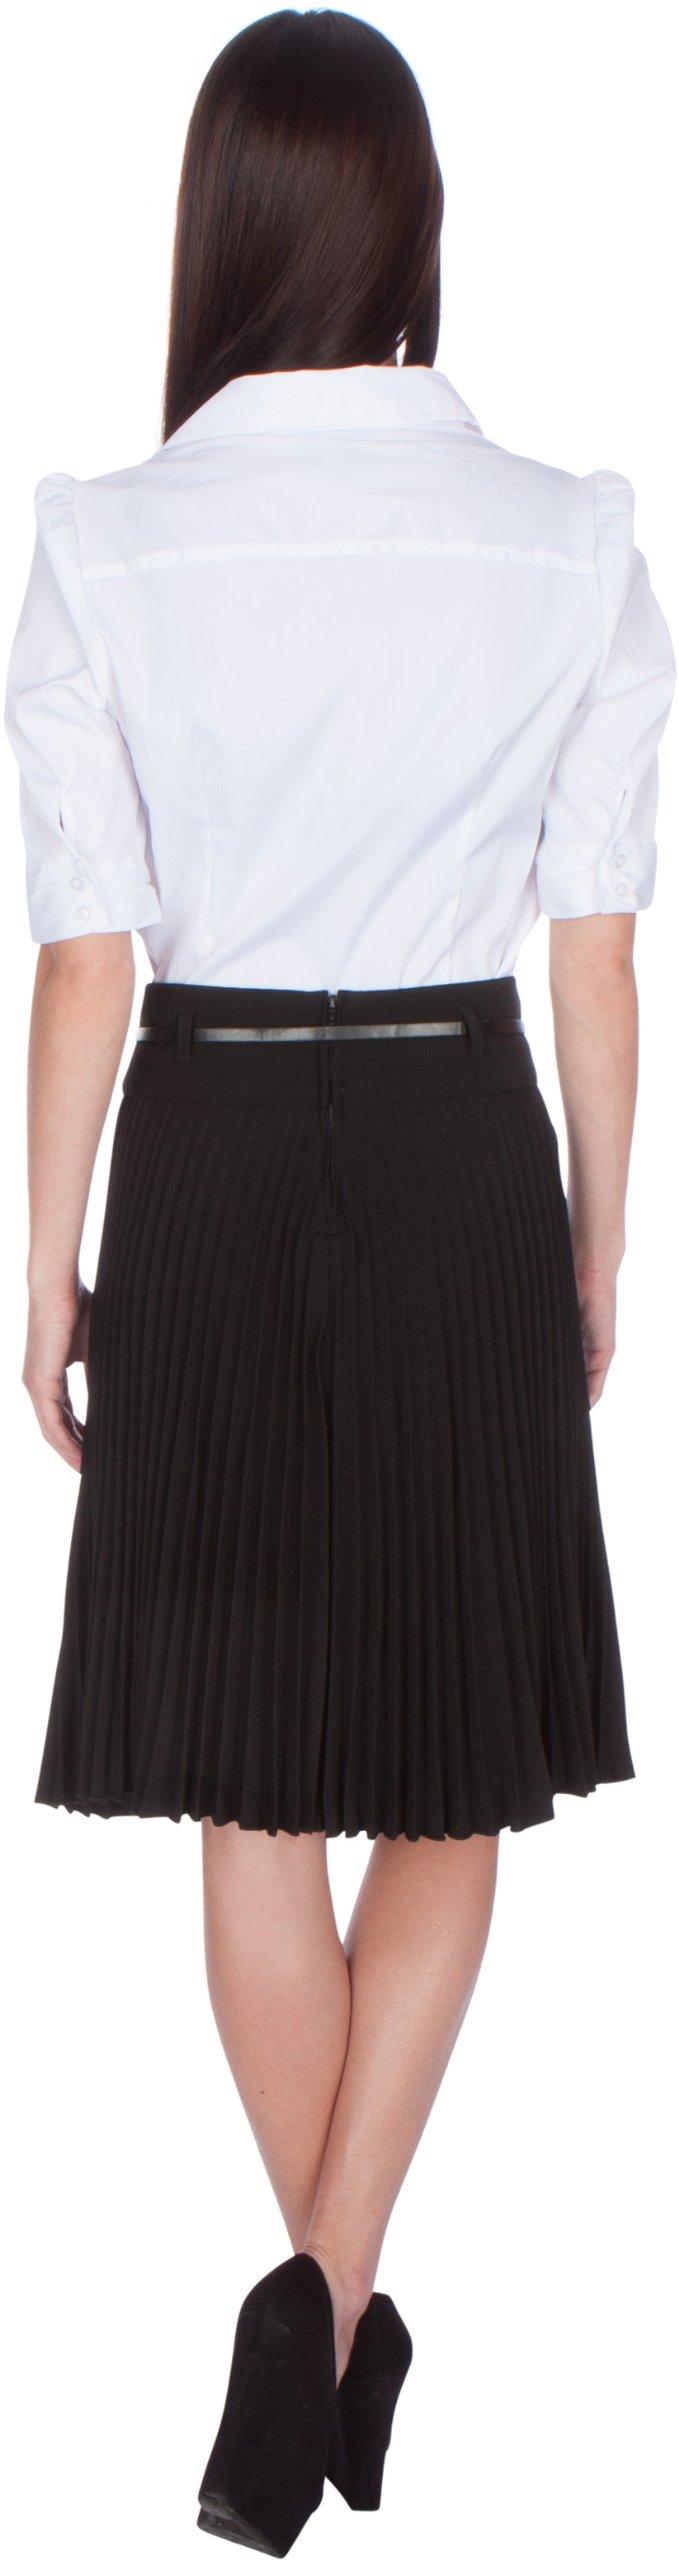 Sakkas FV3543 Knee Length Pleated A-Line Skirt with Skinny Belt - Black/X-Large by Sakkas (Image #4)